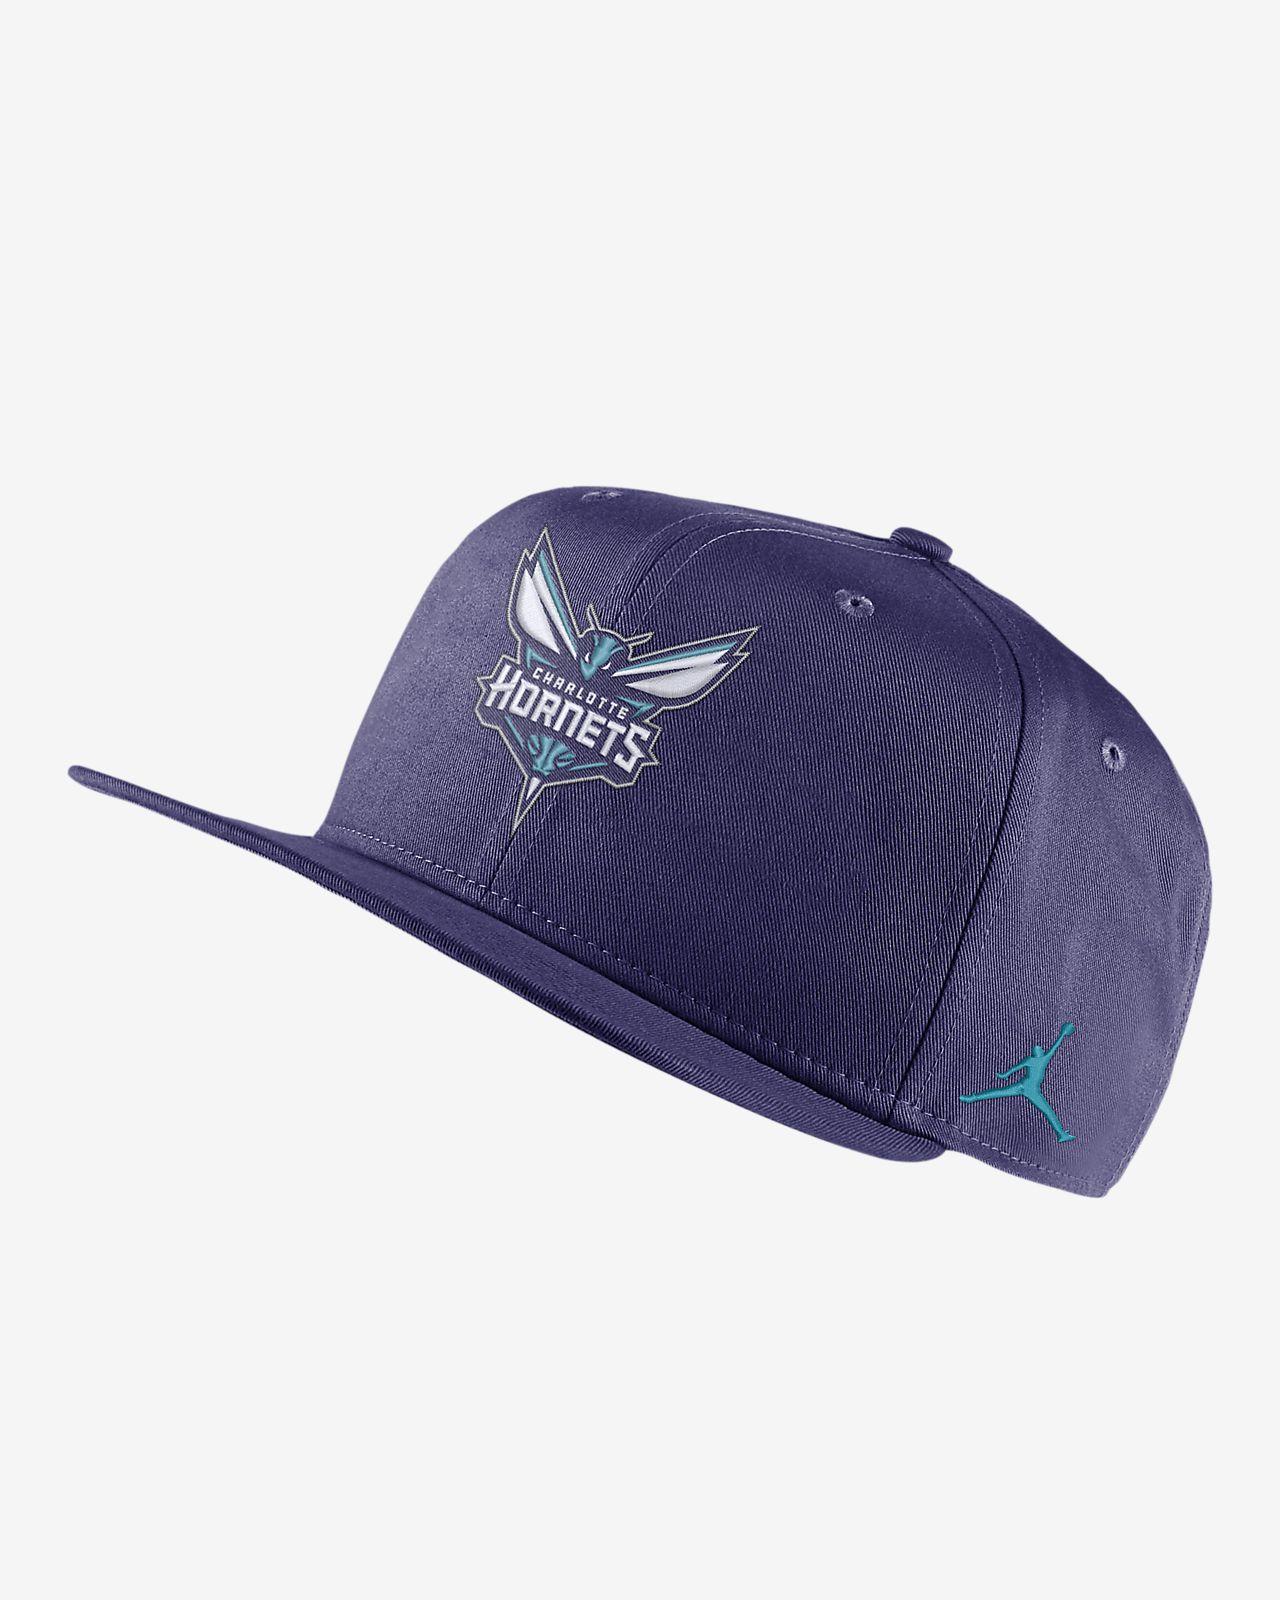 Charlotte Hornets Jordan Pro NBA Cap